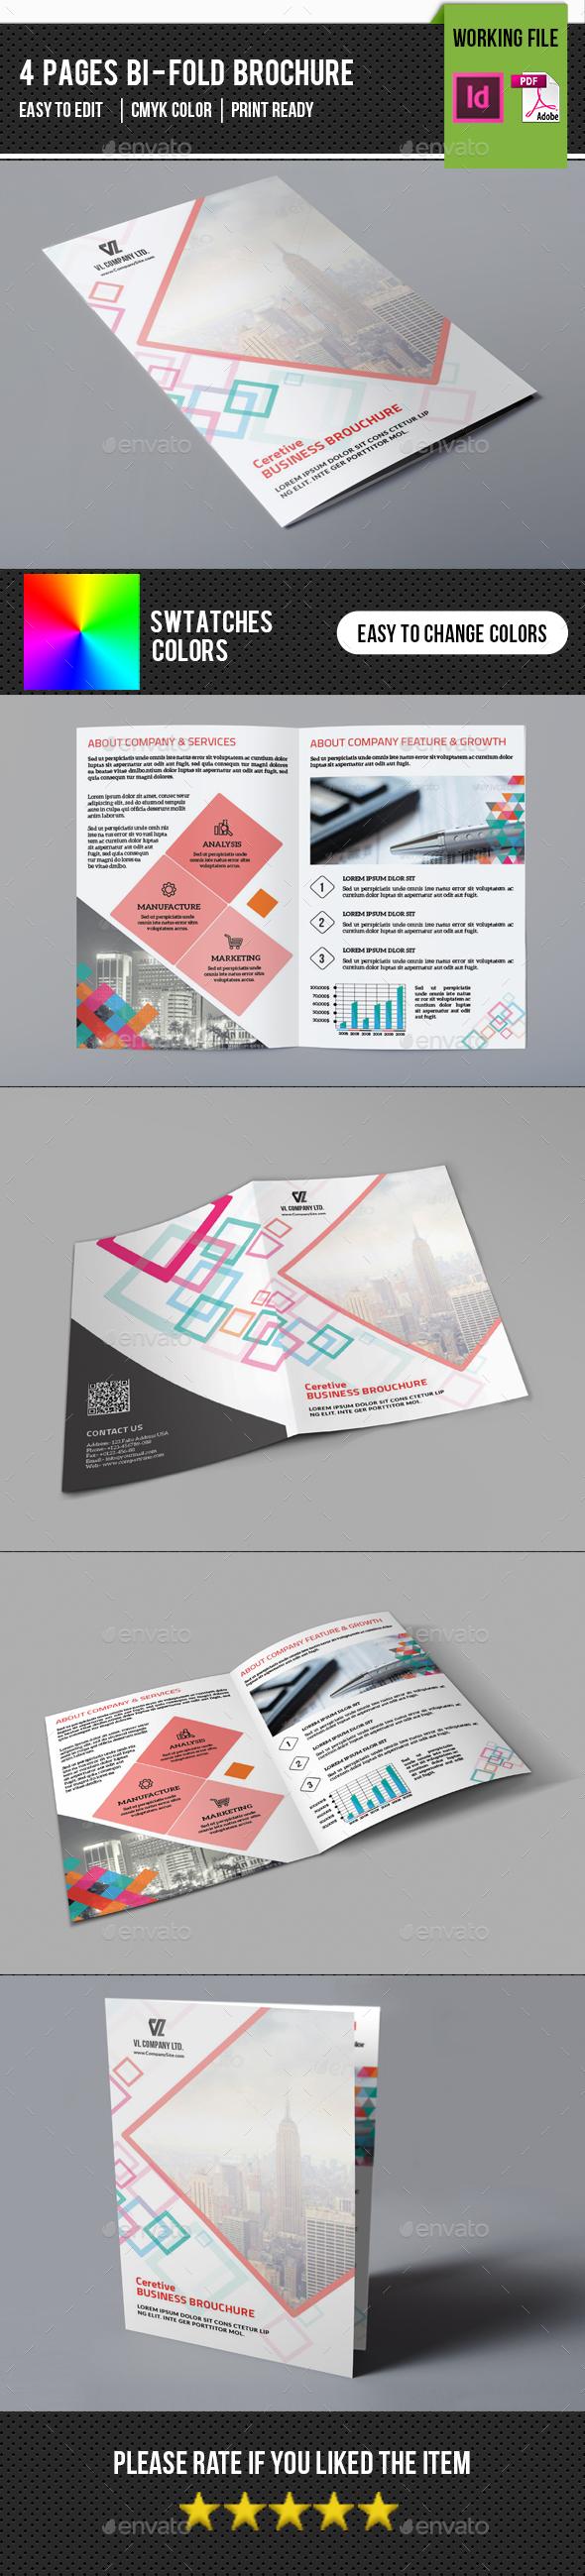 Minimal Corporate Bifold Brochure-V333 - Corporate Brochures